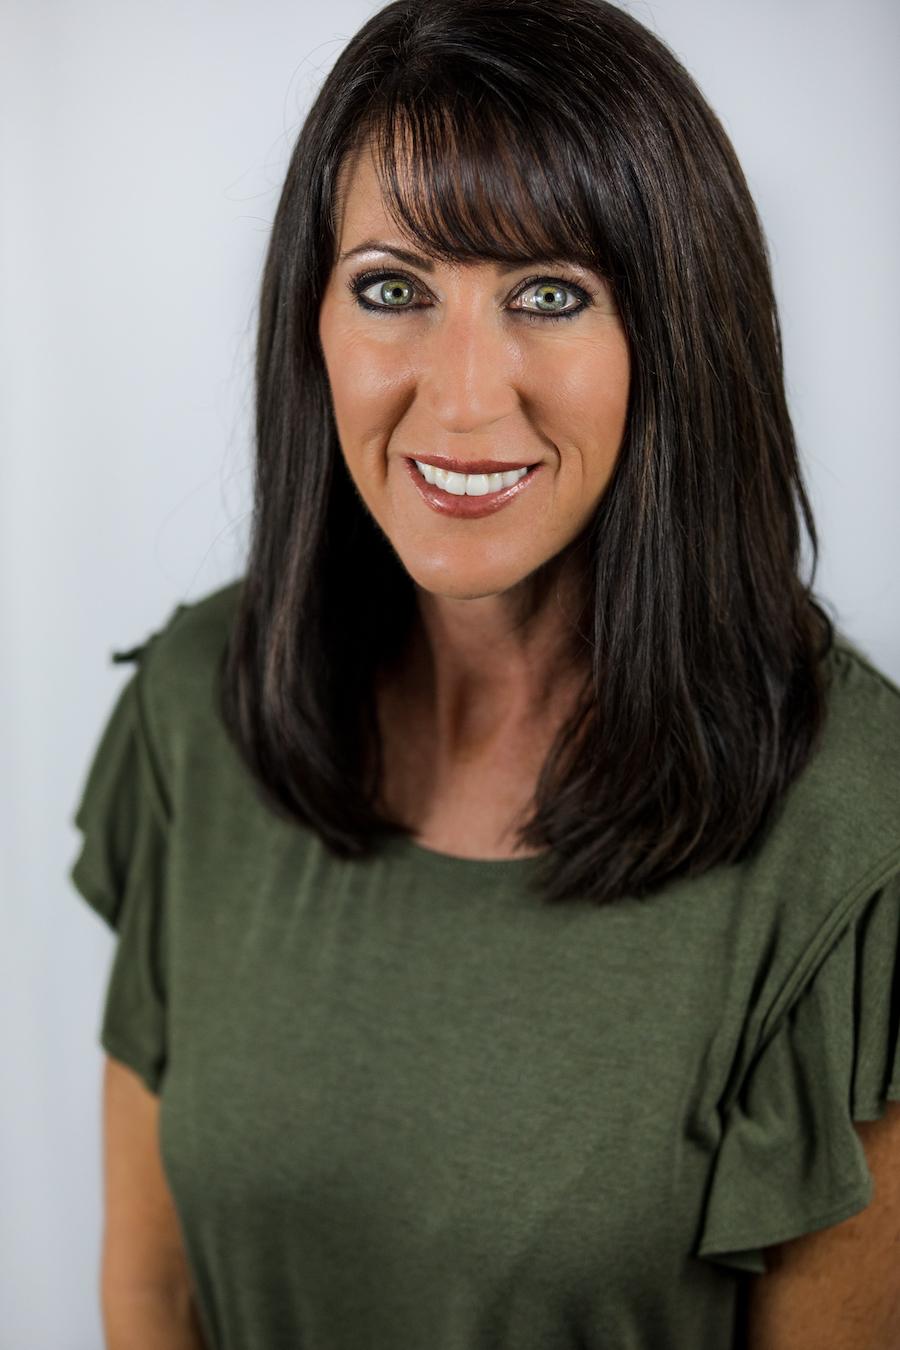 Erica Anselmo